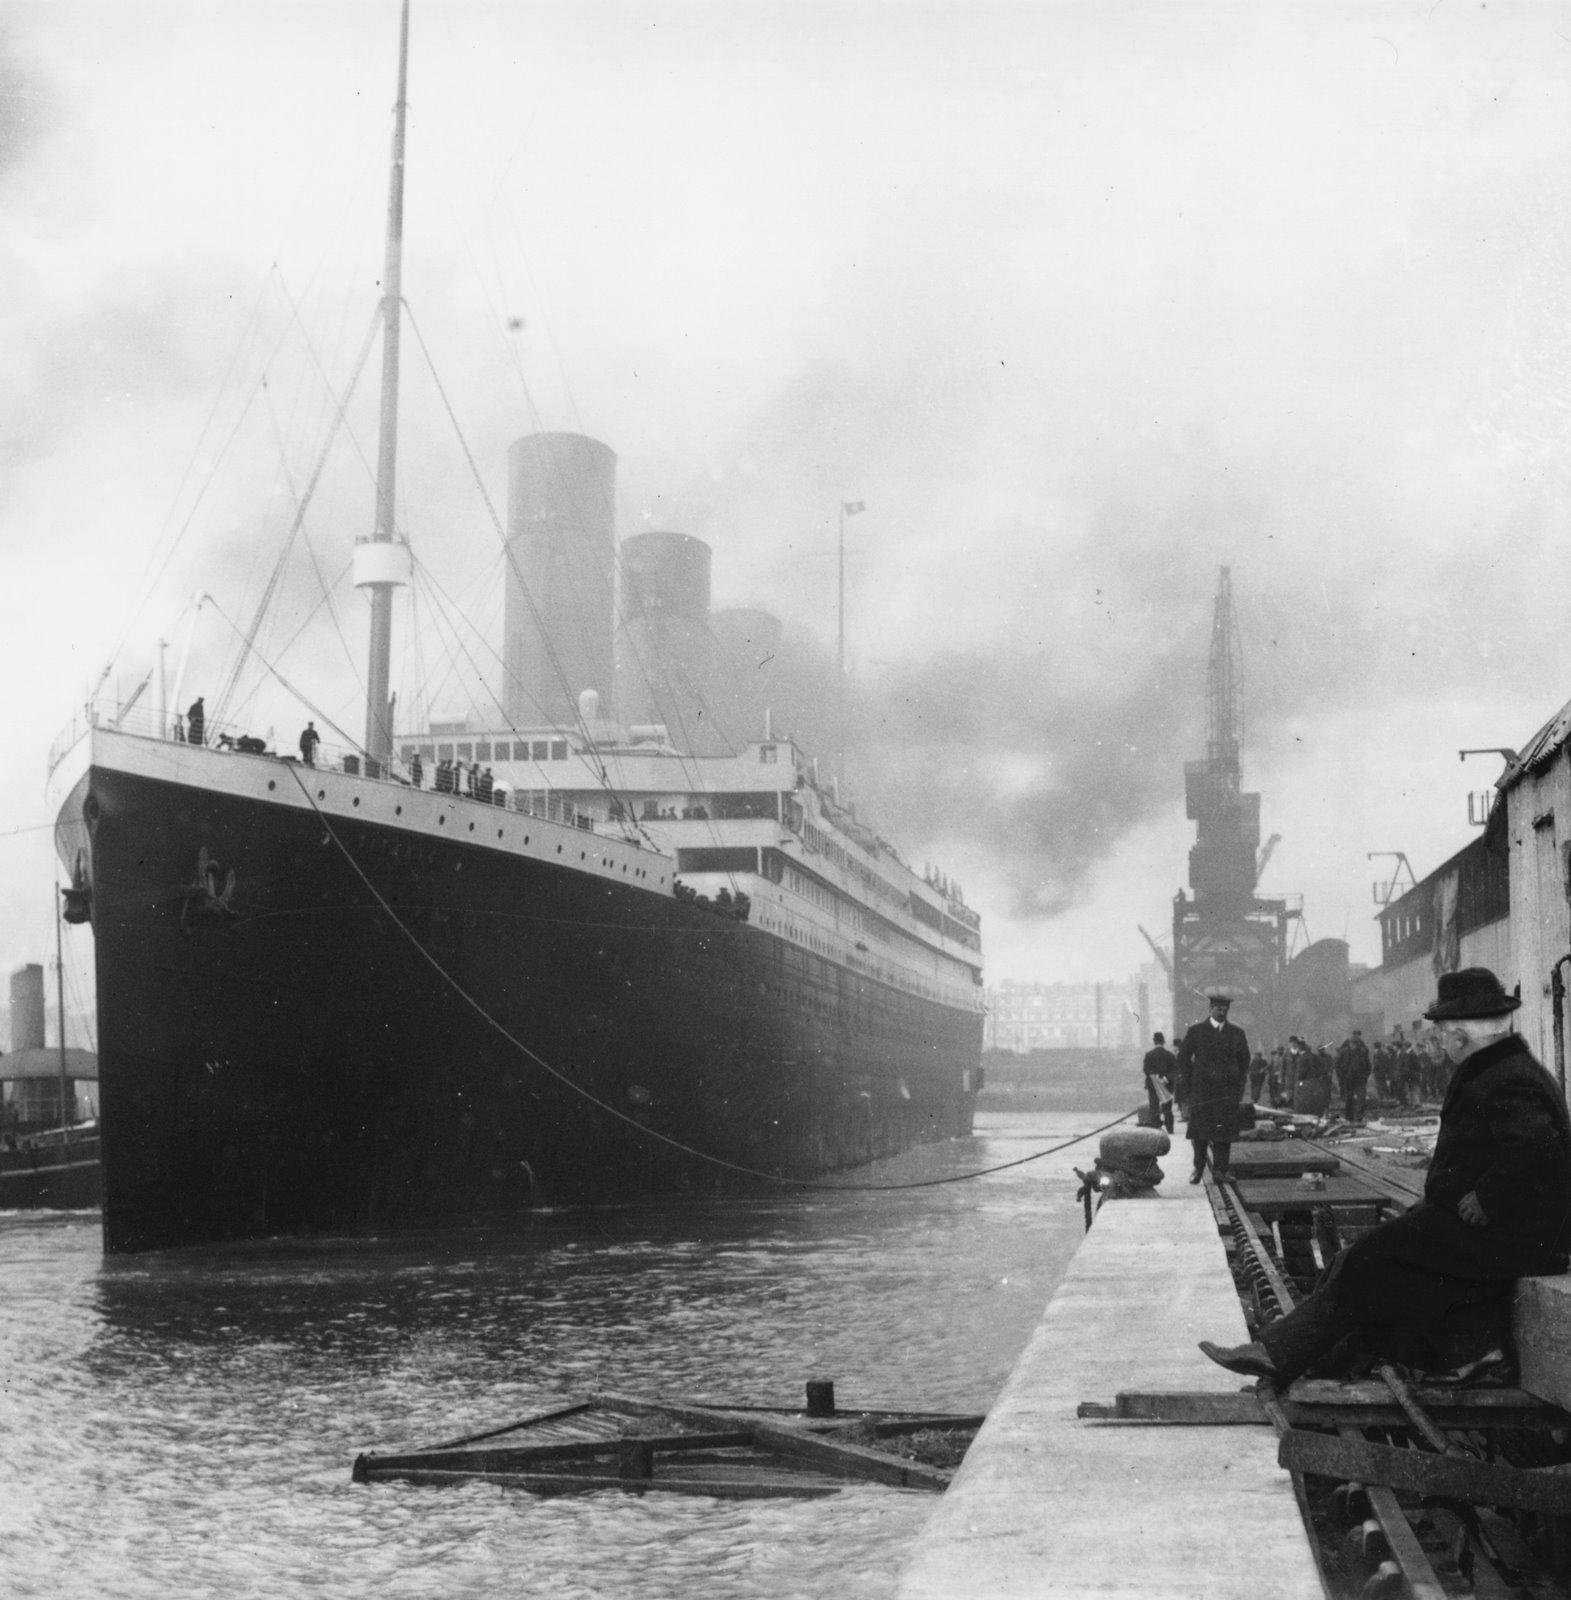 http://www.suefrause.com/blog/uploaded_images/Titanic-in-dock-751846.jpg